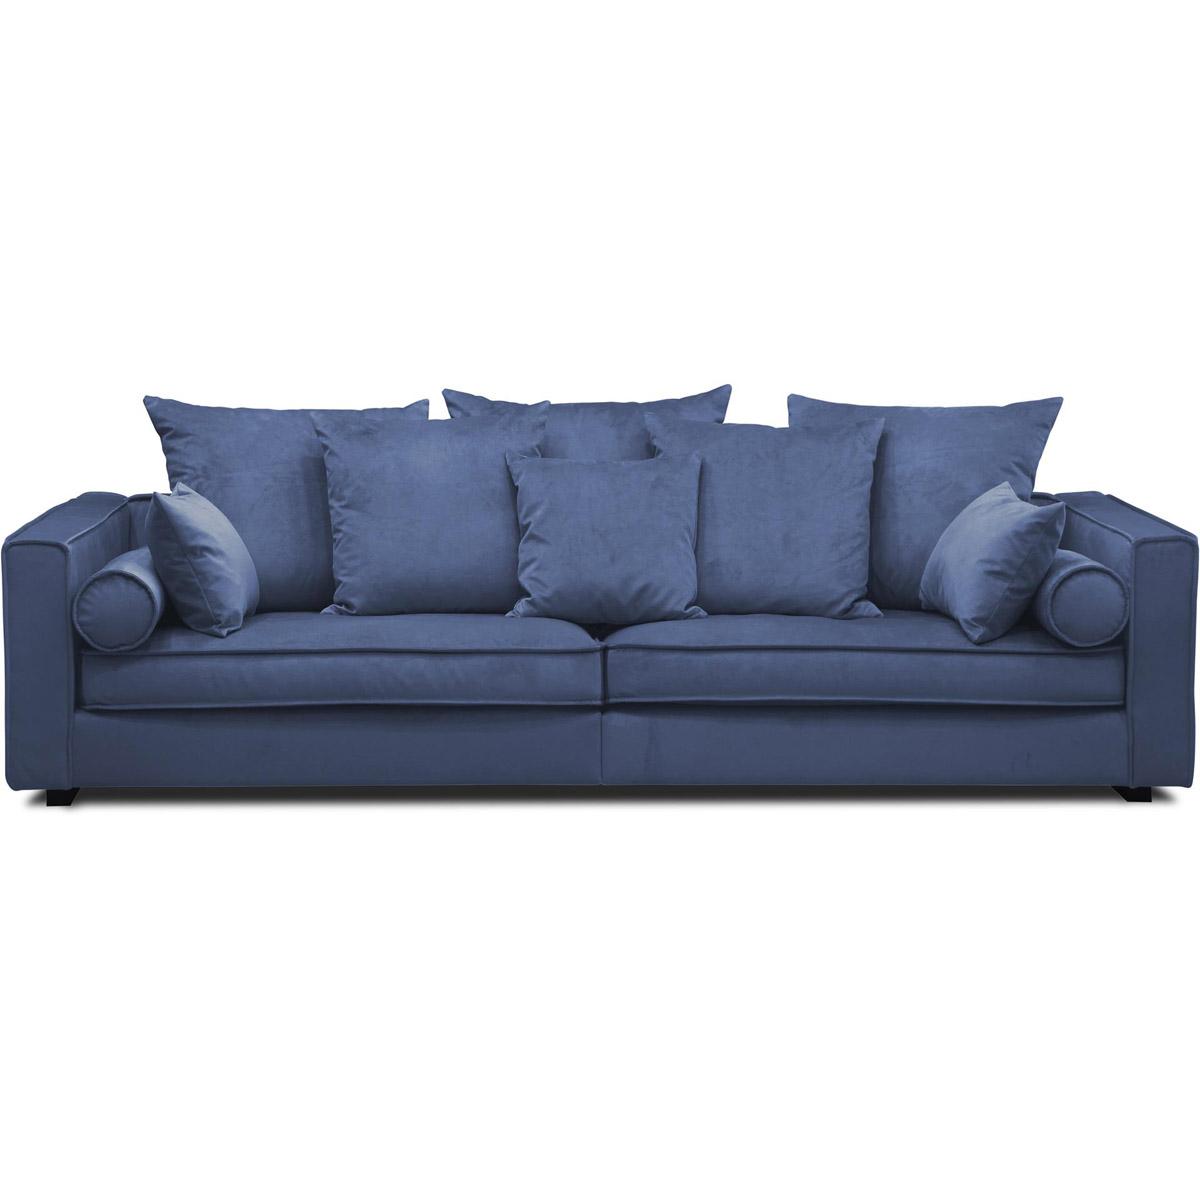 Luca-stor-soffa-3,5-sits-tyg-blå